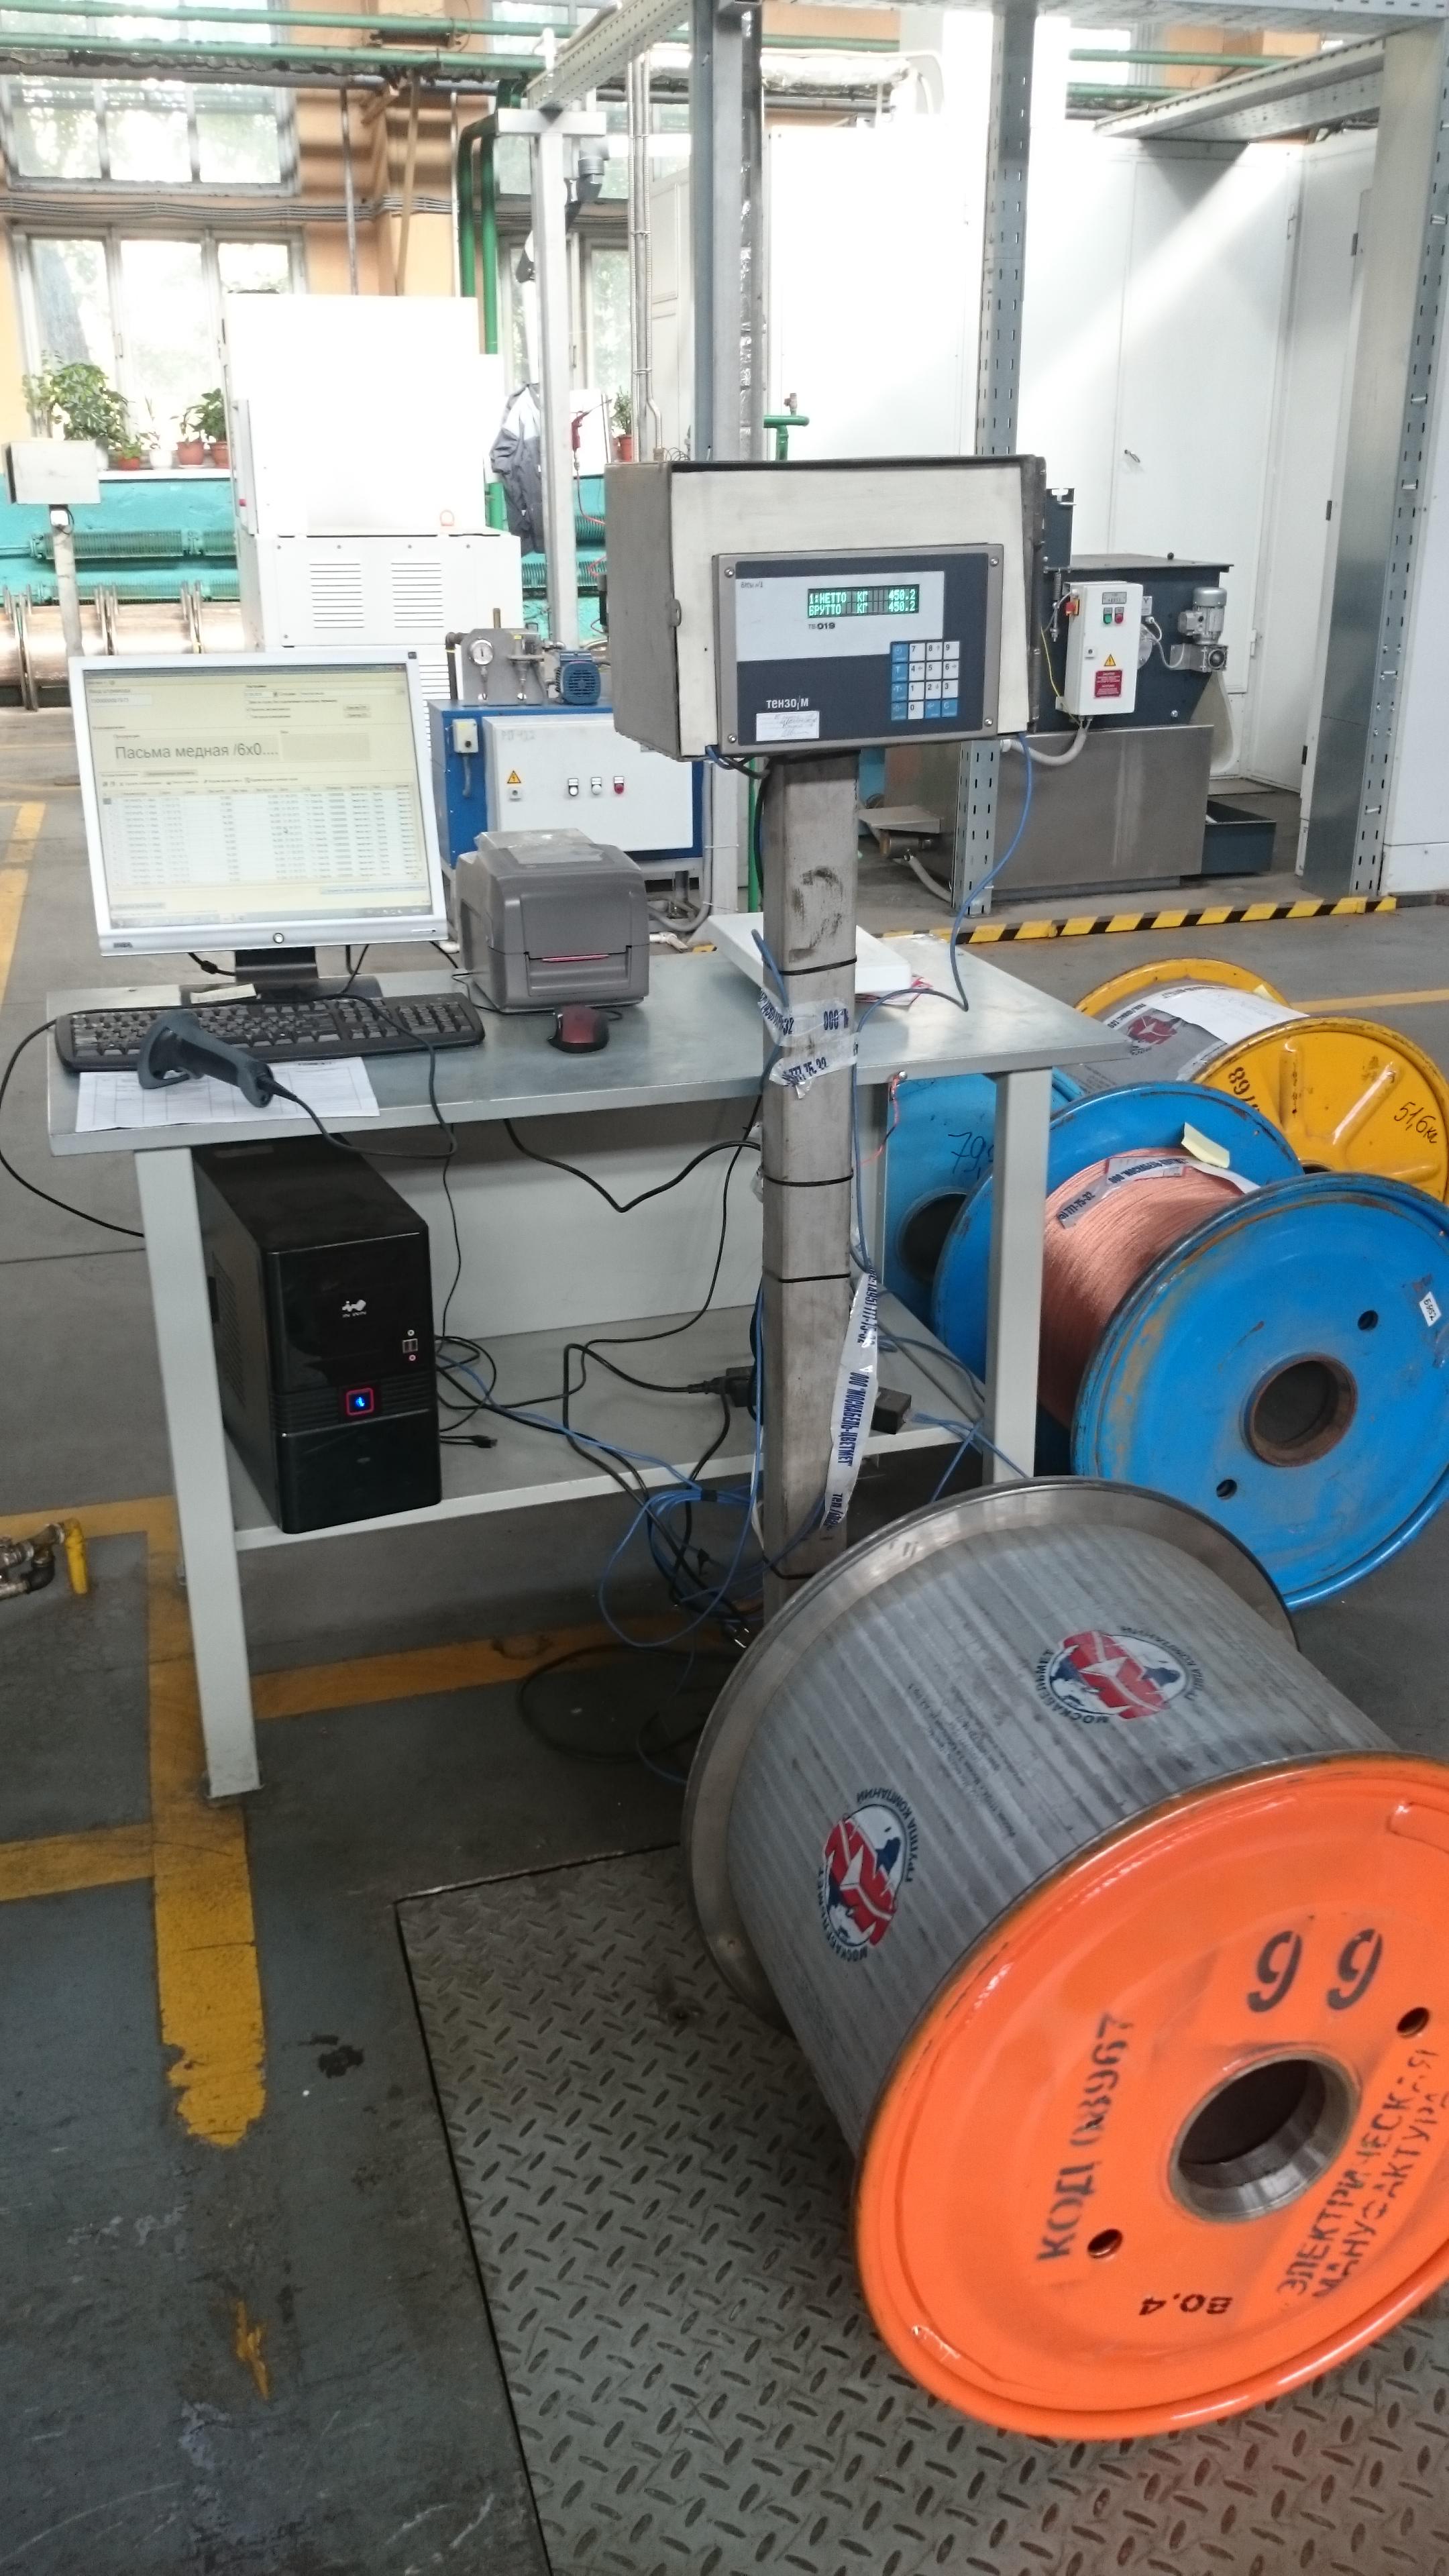 АРМ Весового оборудования